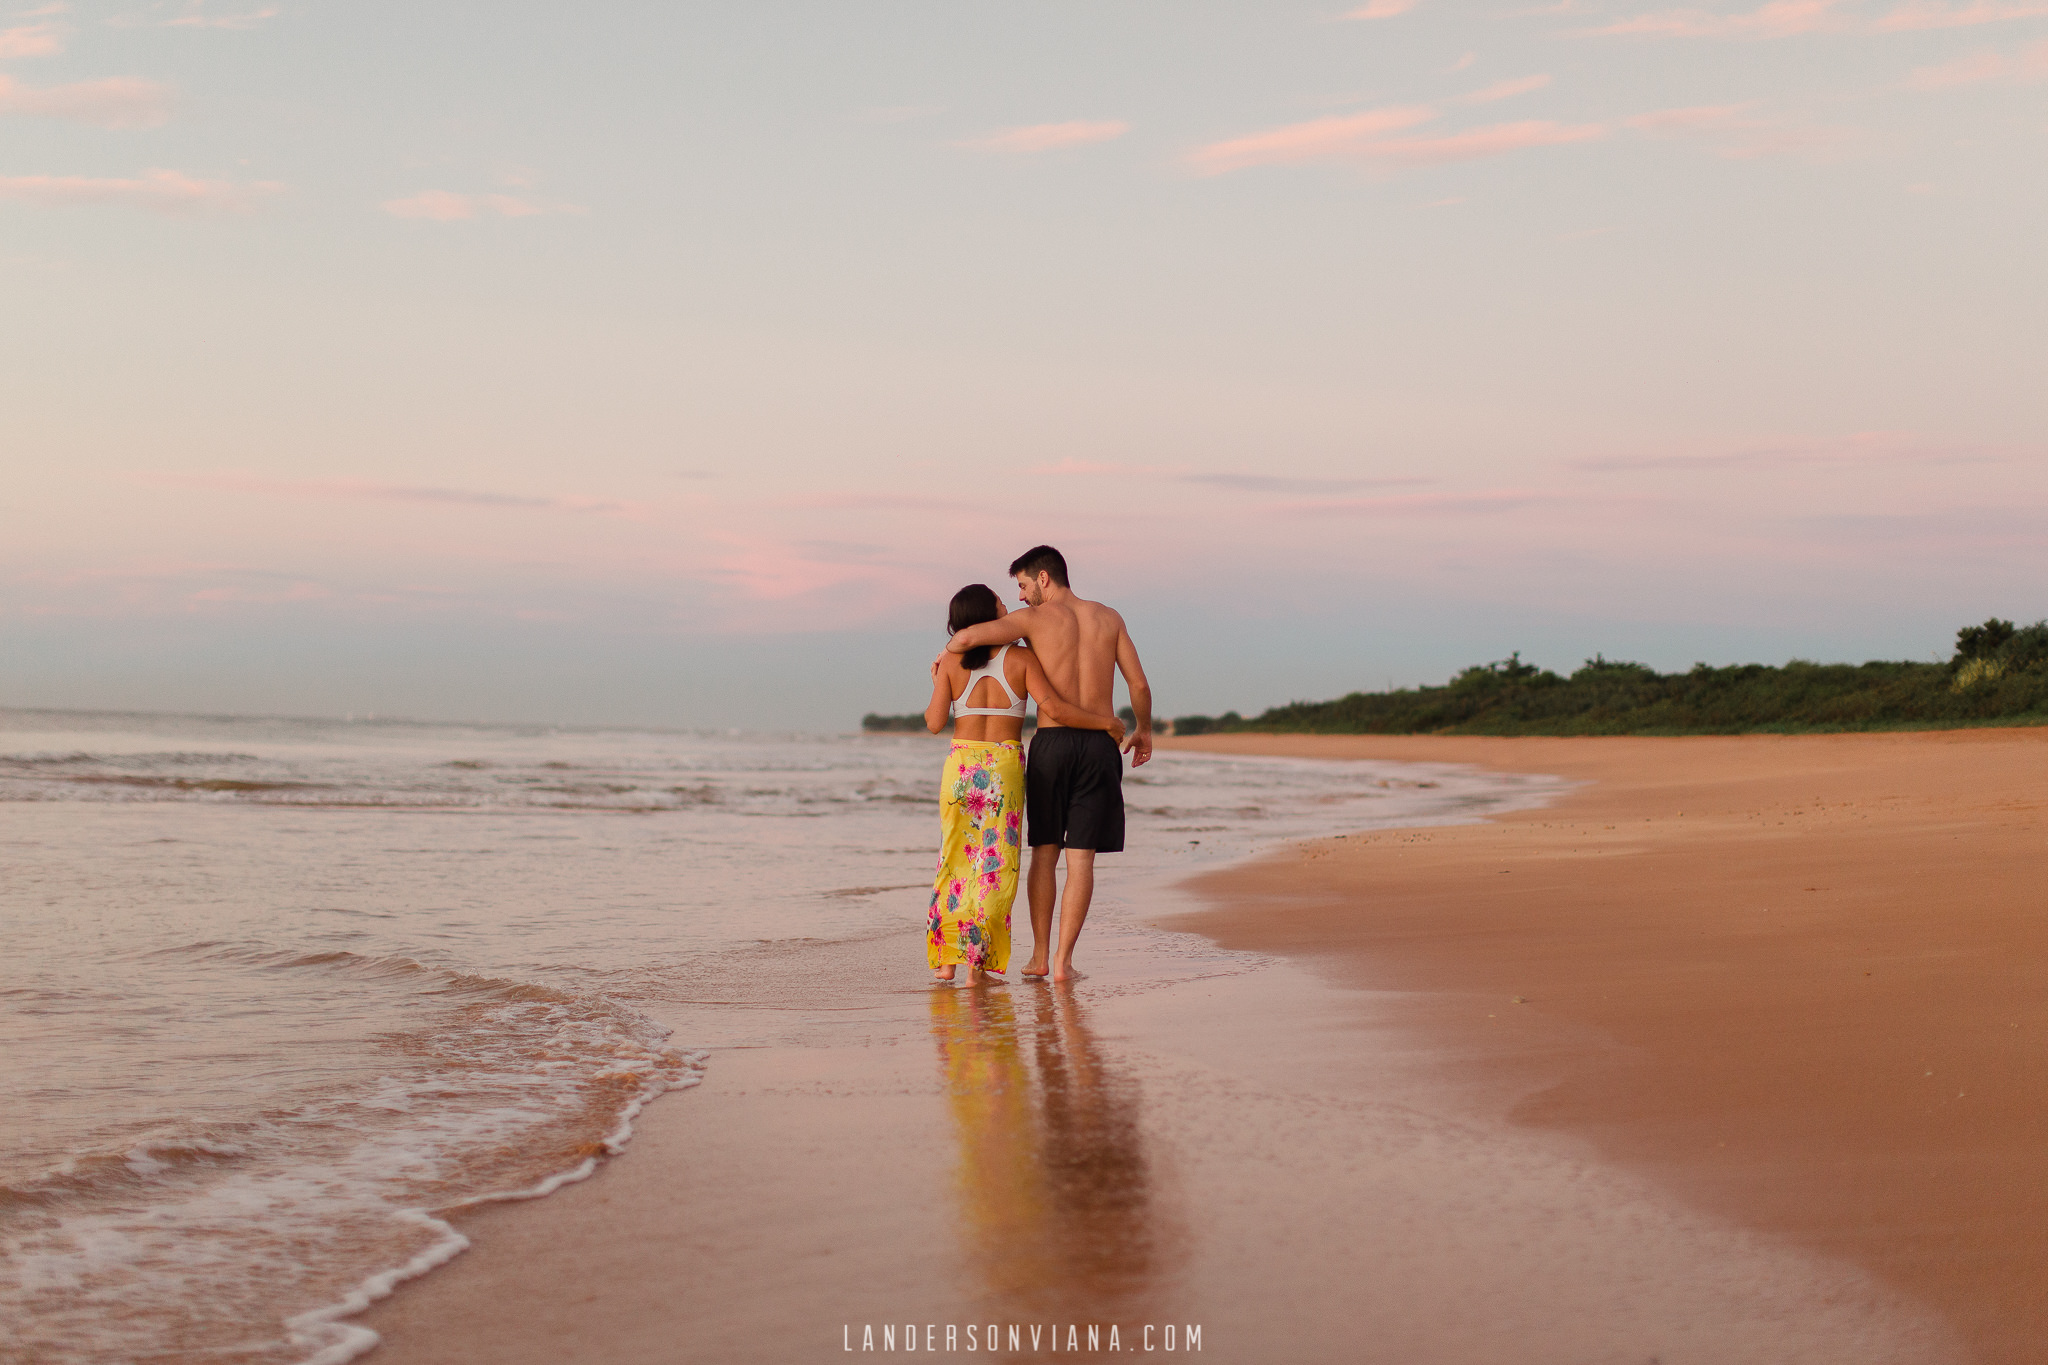 ensaio-pre-wedding-praia-landerson-viana-fotografia-casamento-pegueiobouquet-55.jpg